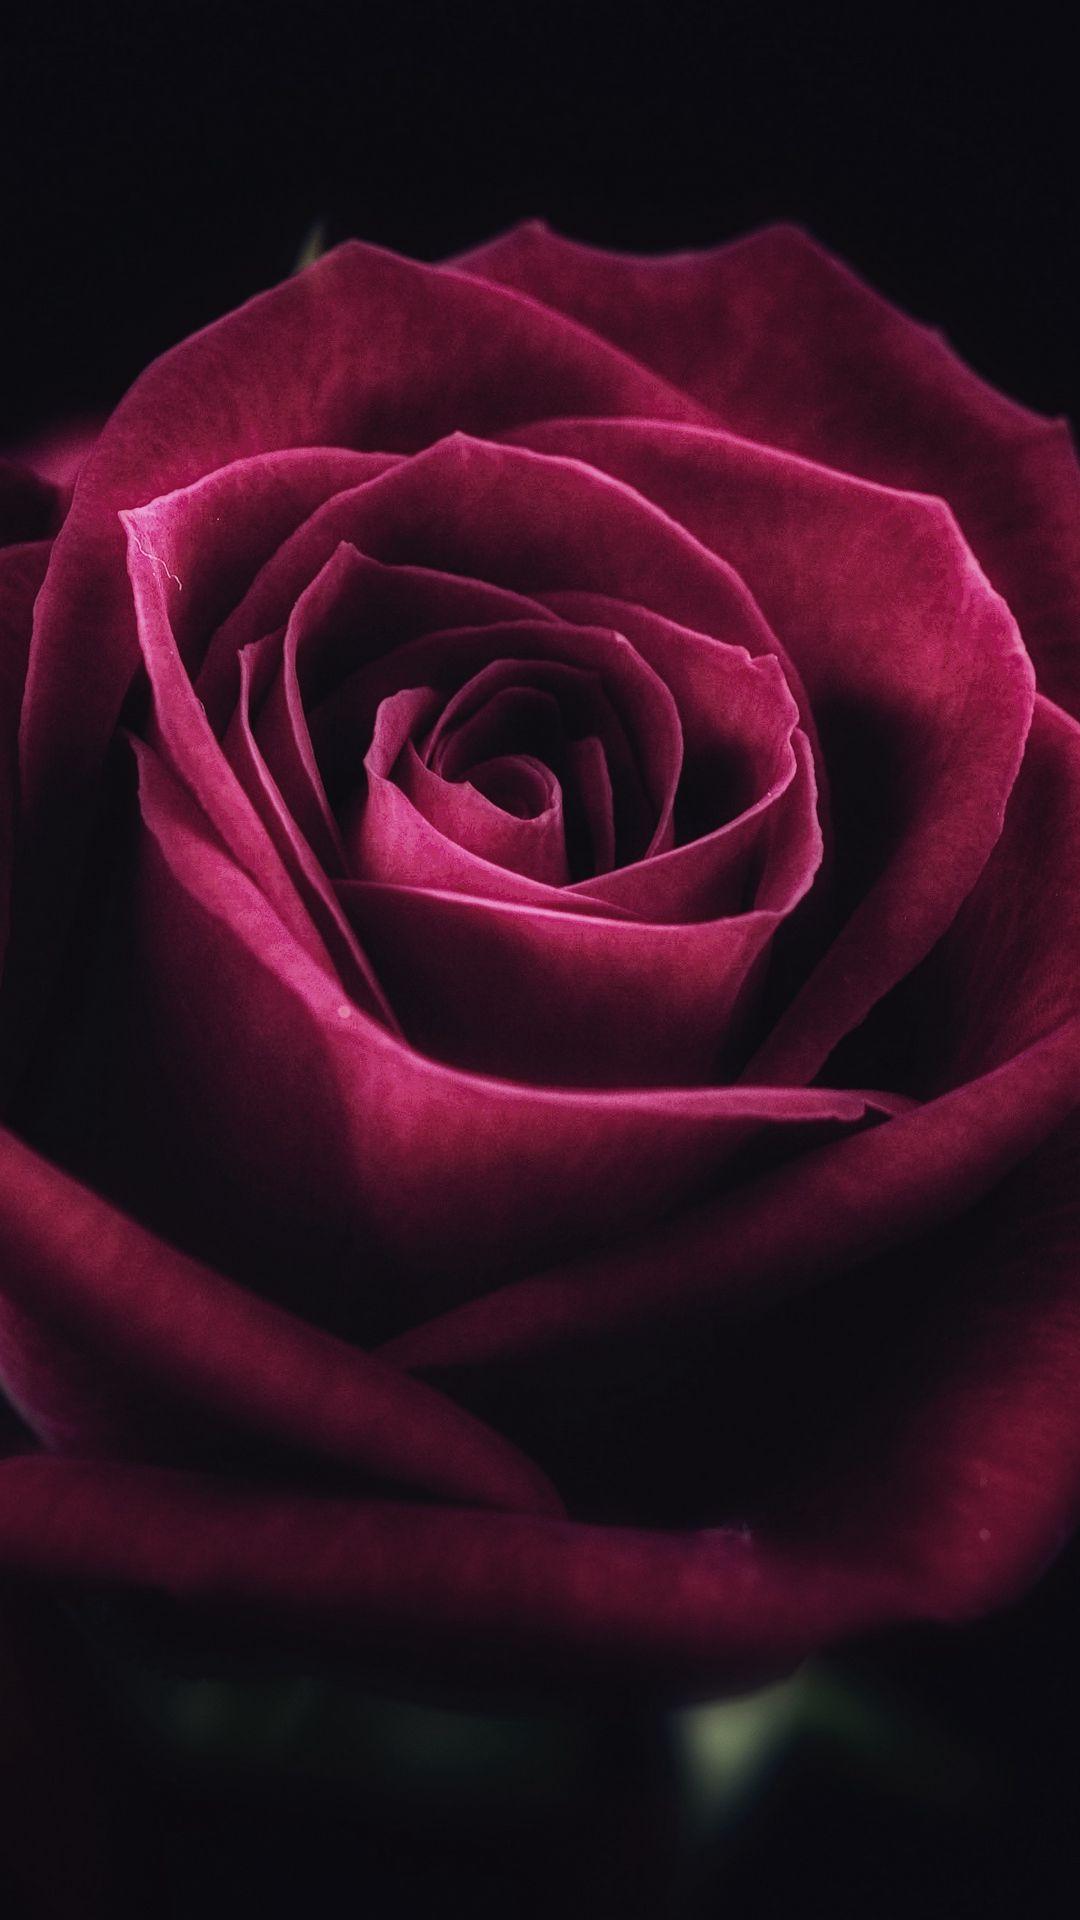 1080x1920 Wallpaper rose, flower, close-up, petals